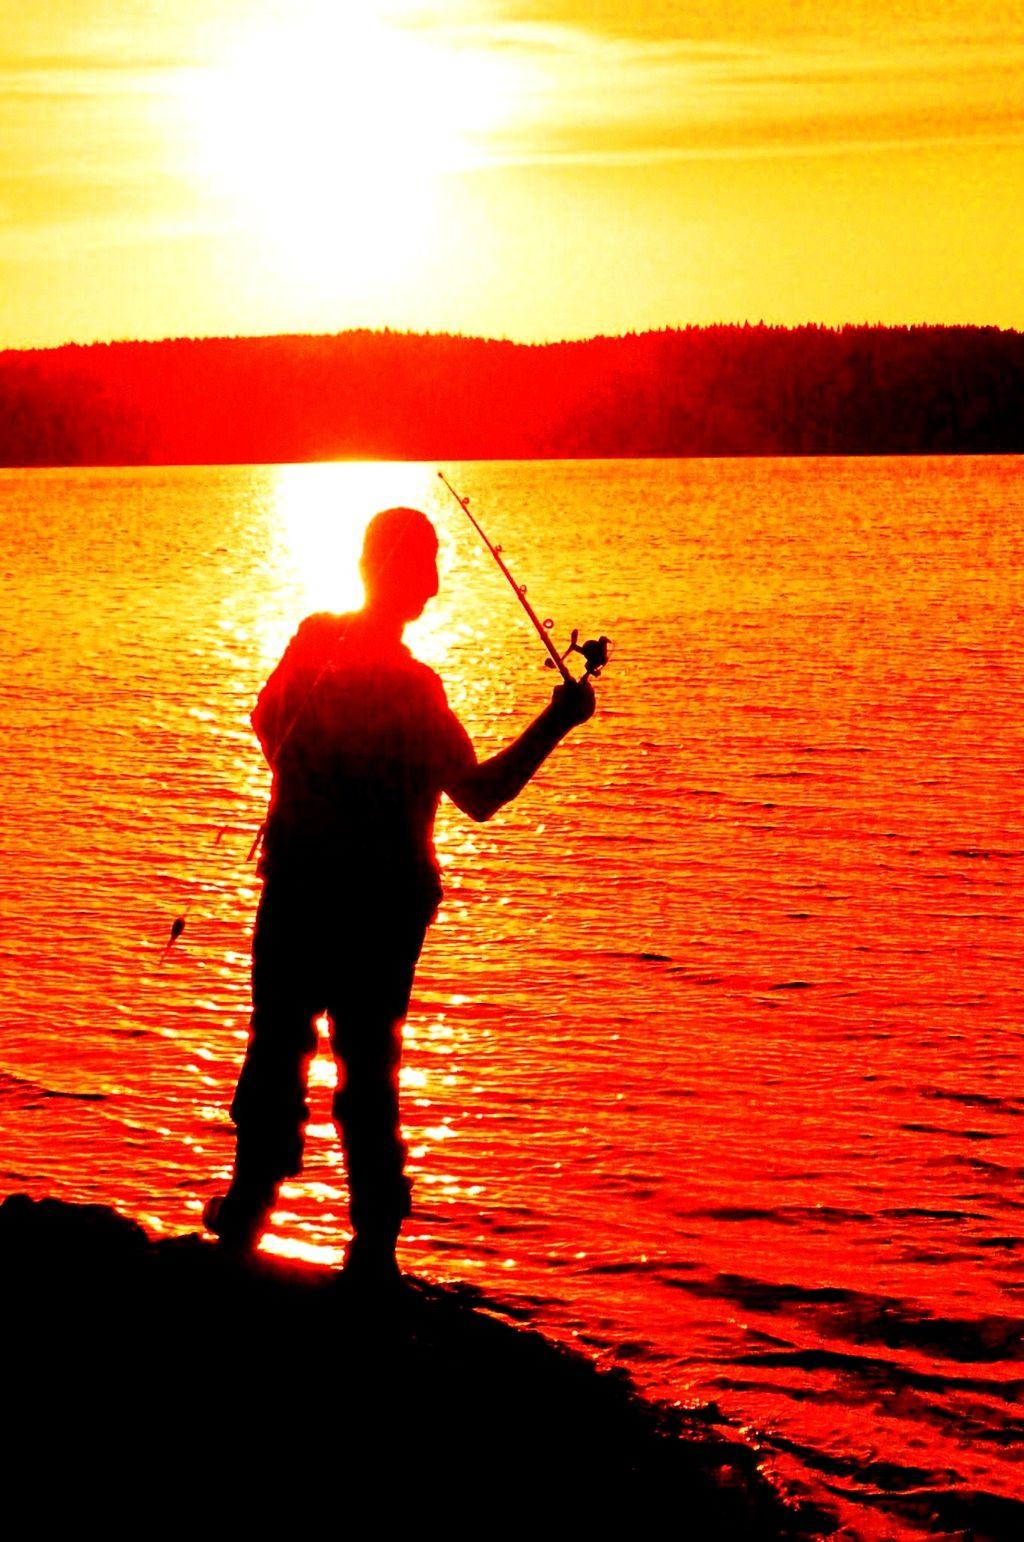 Название: рыбалка на закате.JPG Просмотров: 251  Размер: 253.8 Кб